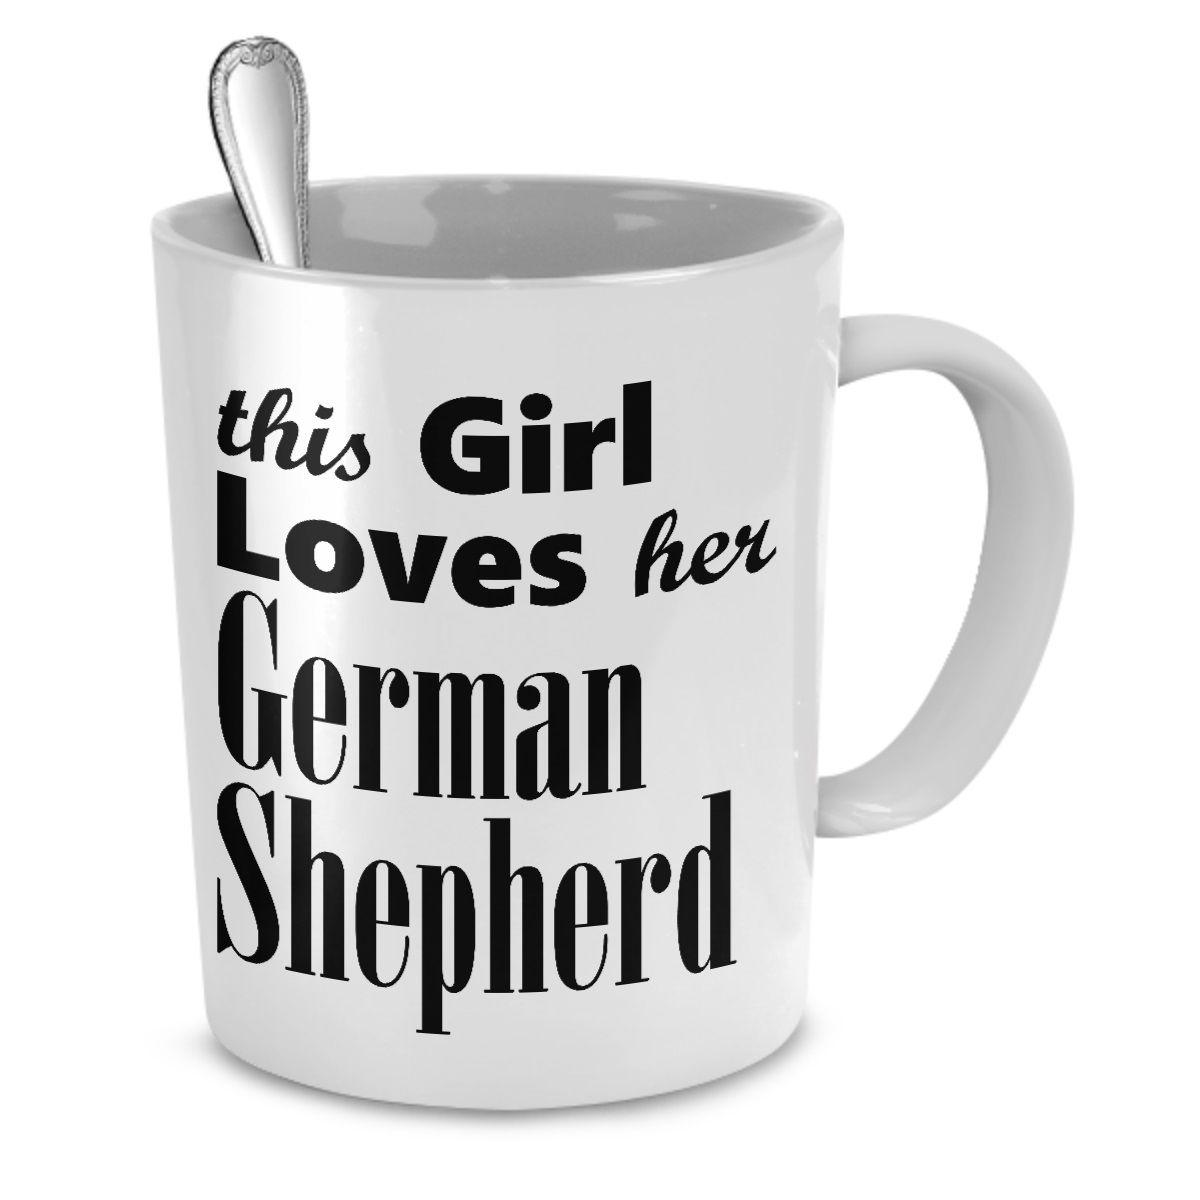 German shepherd dog mug german shepherd dogs shepherd